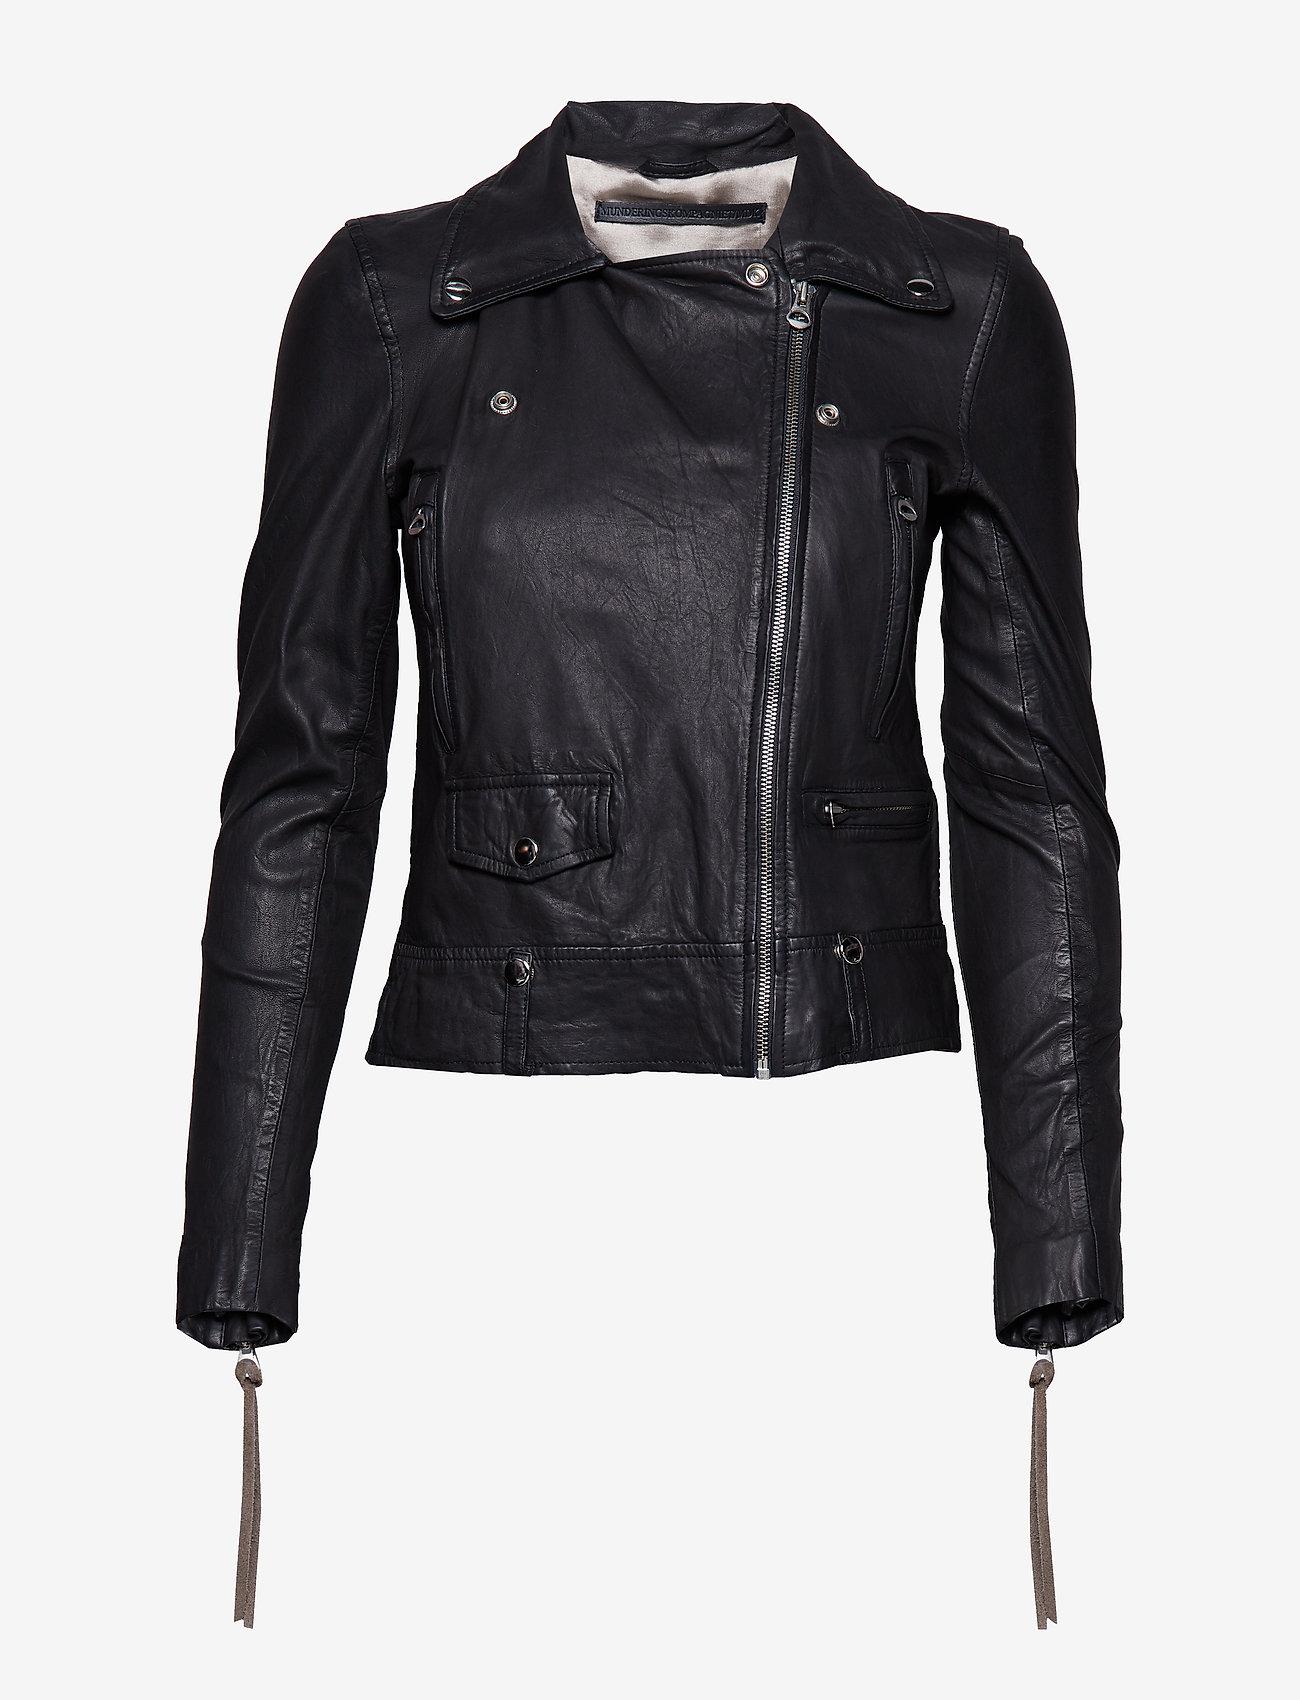 MDK / Munderingskompagniet - Seattle new thin leather jacket (yellow) - skinnjackor - black - 1